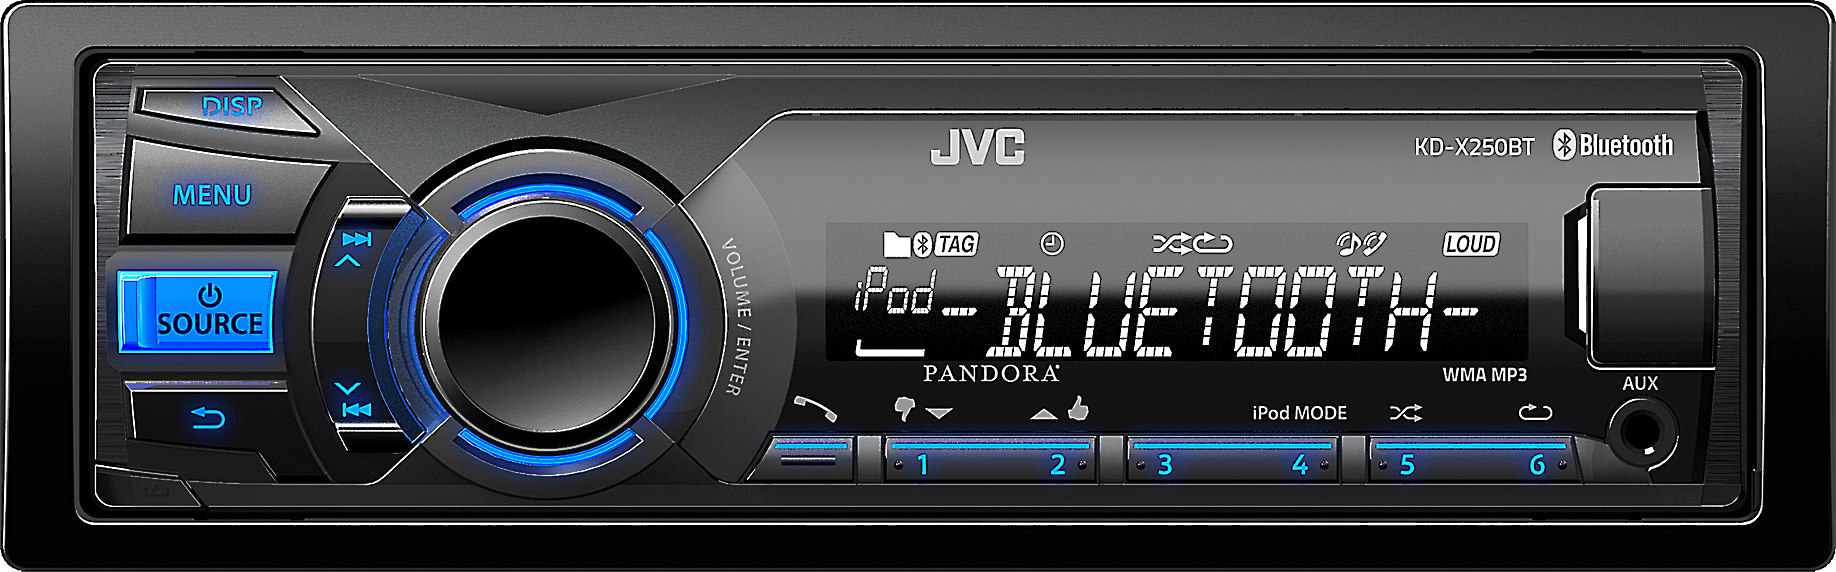 hight resolution of jvc kd x250bt wiring diagram